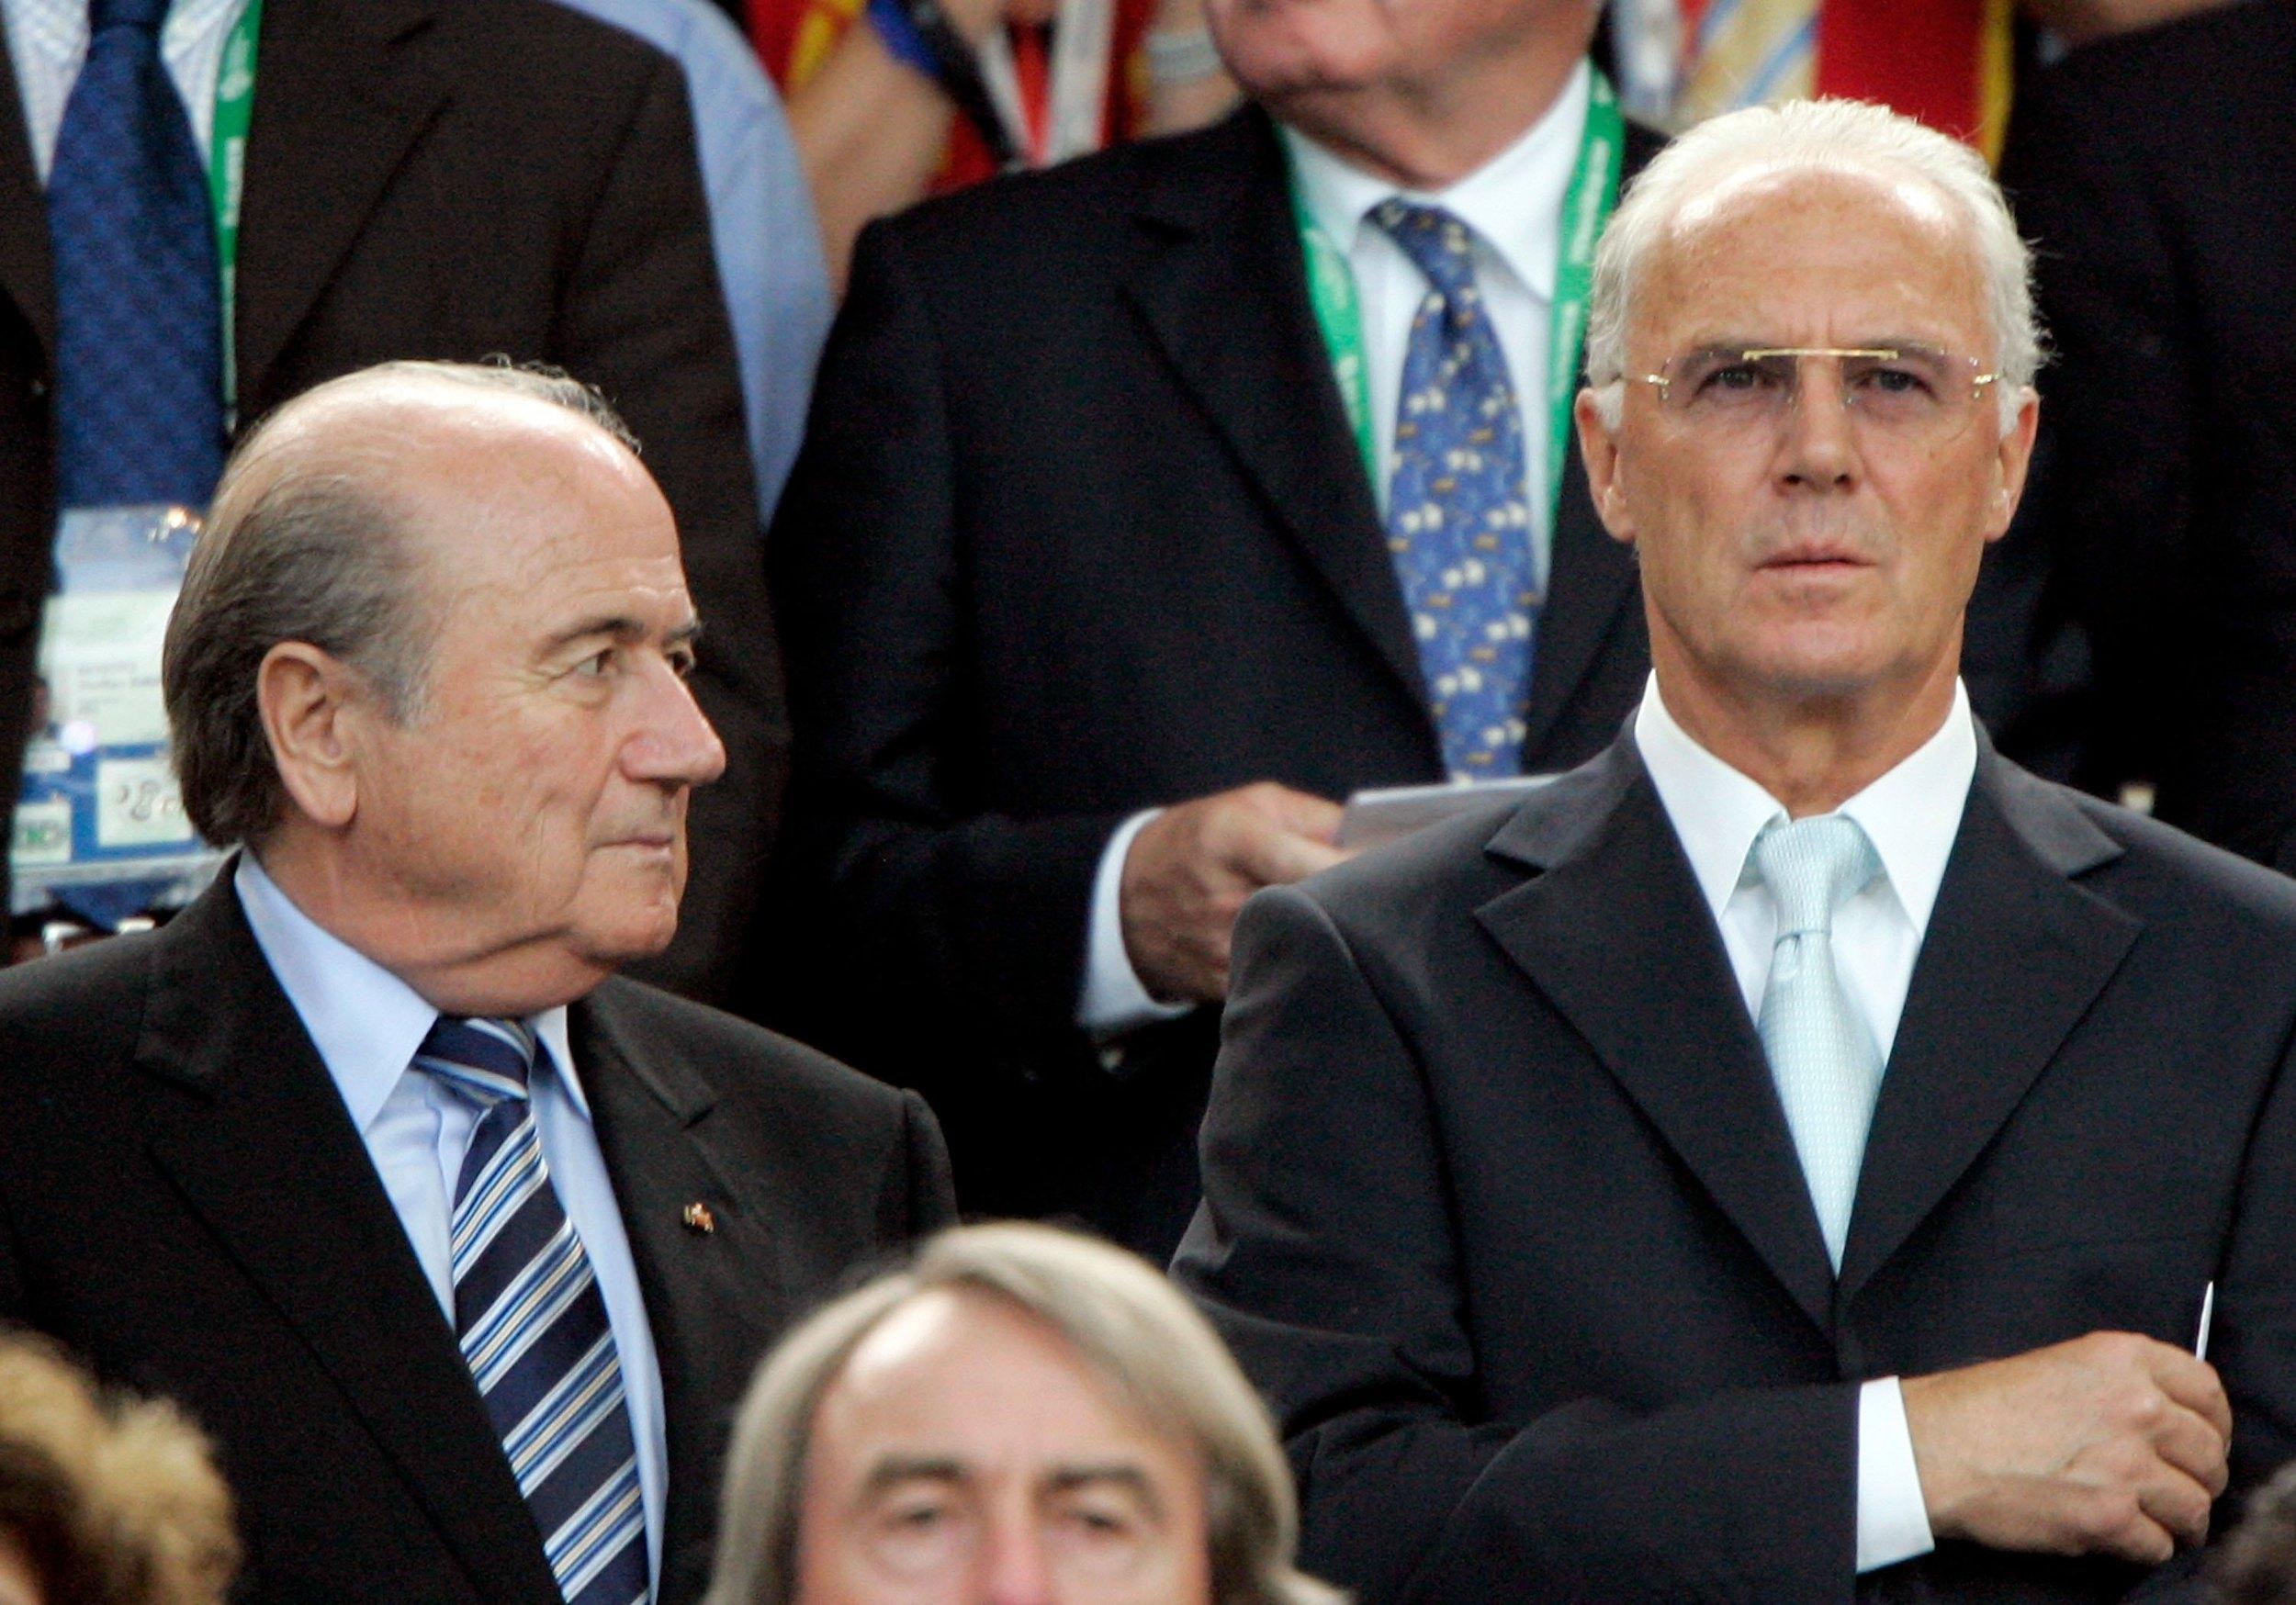 Sepp Blatter med Franz Beckenbauer til VM i 2006. Men hvordan fik Tyskland værtsskabet? Foto: Getty Images/Cristoph Koepsel.